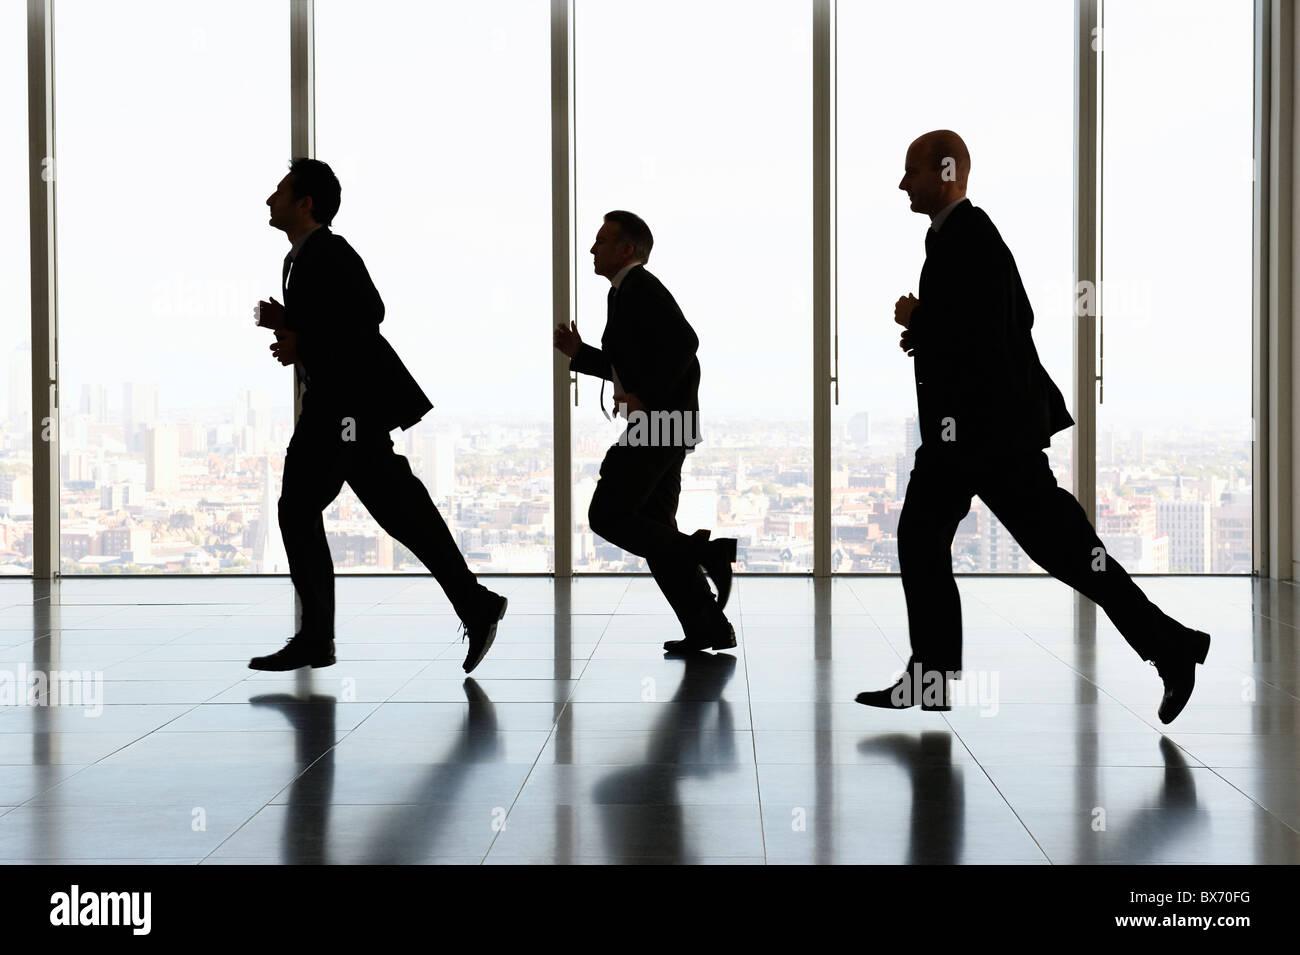 Businessmen running past window, city landscape in background - Stock Image